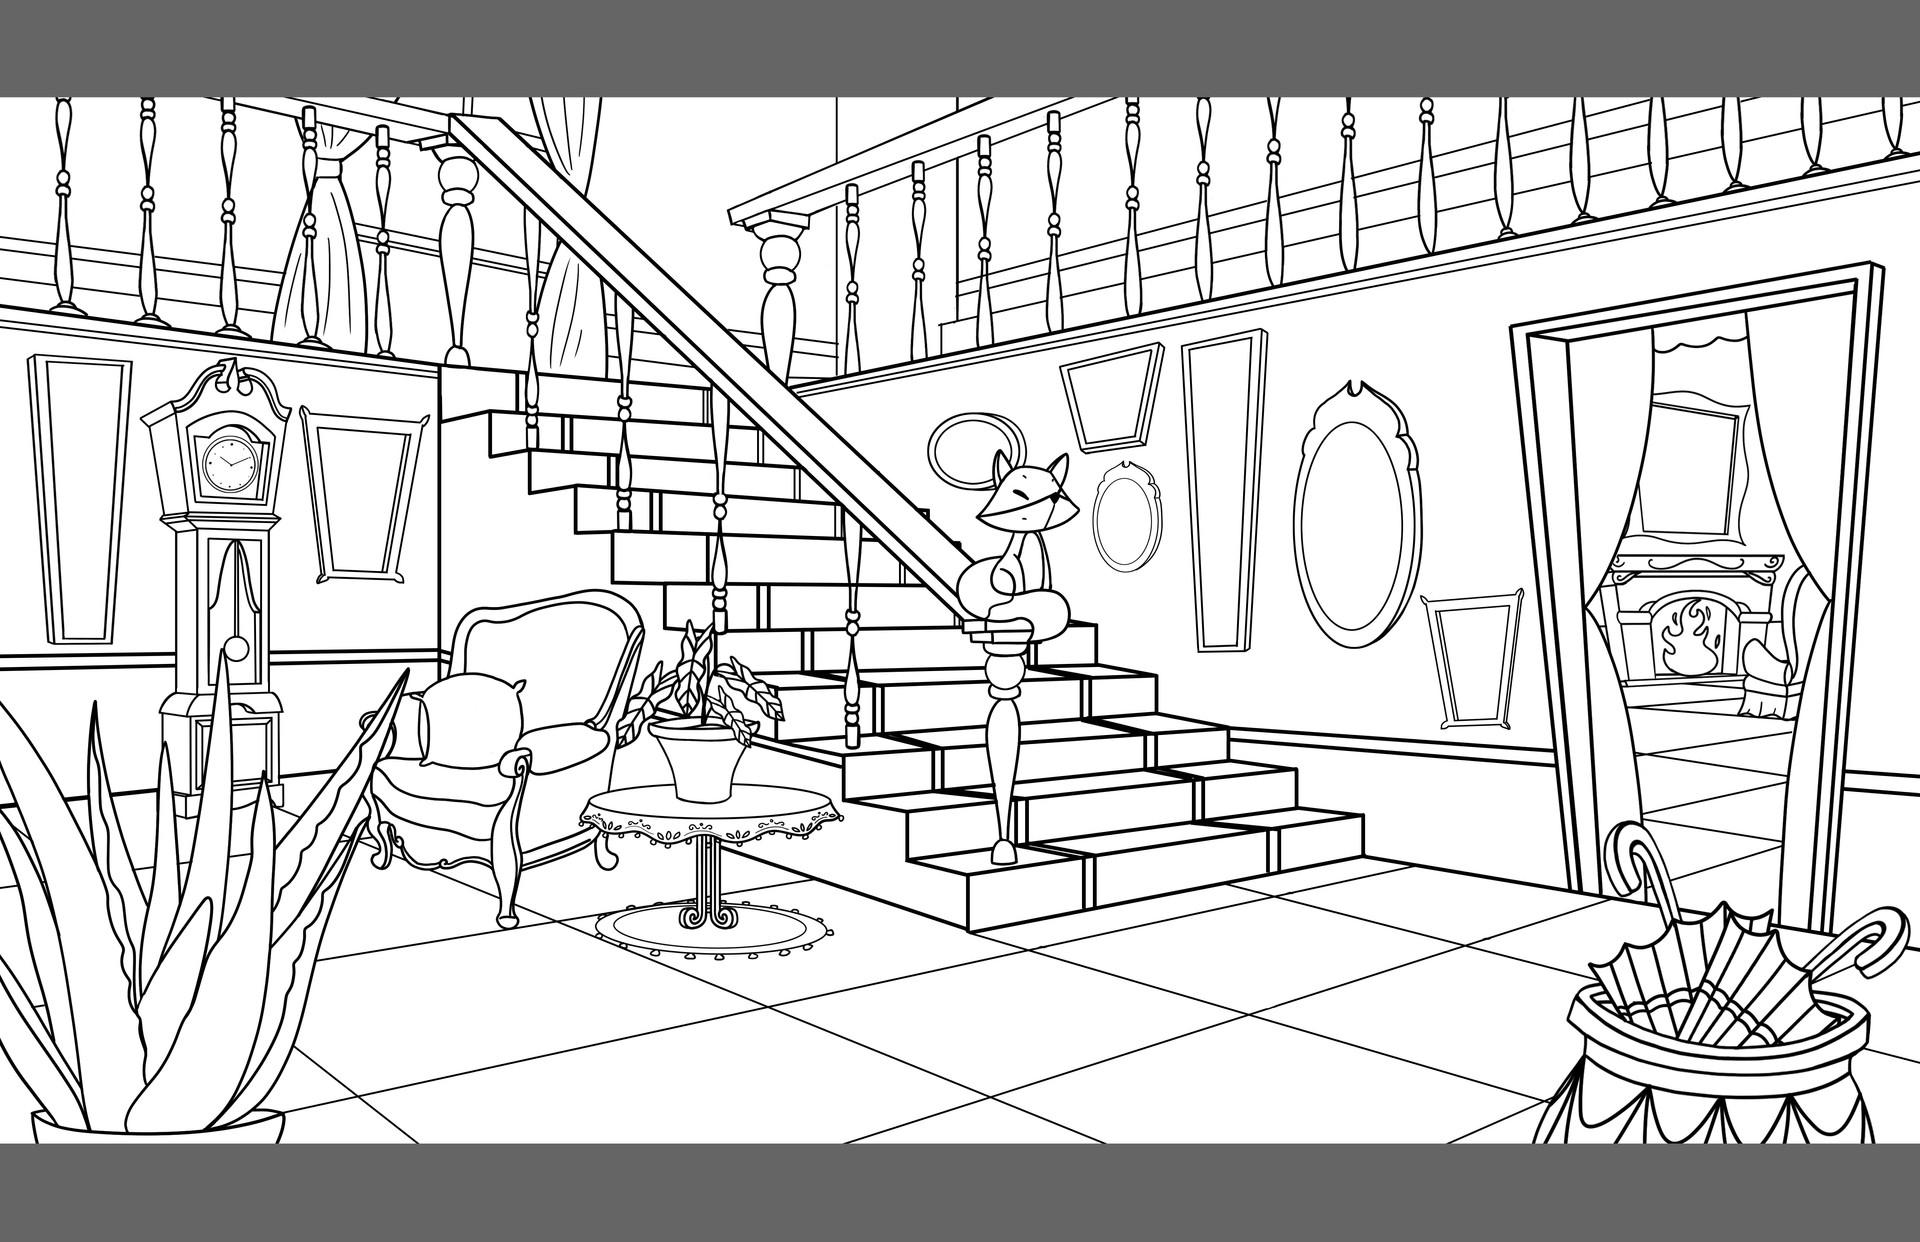 livind room stairs.jpg